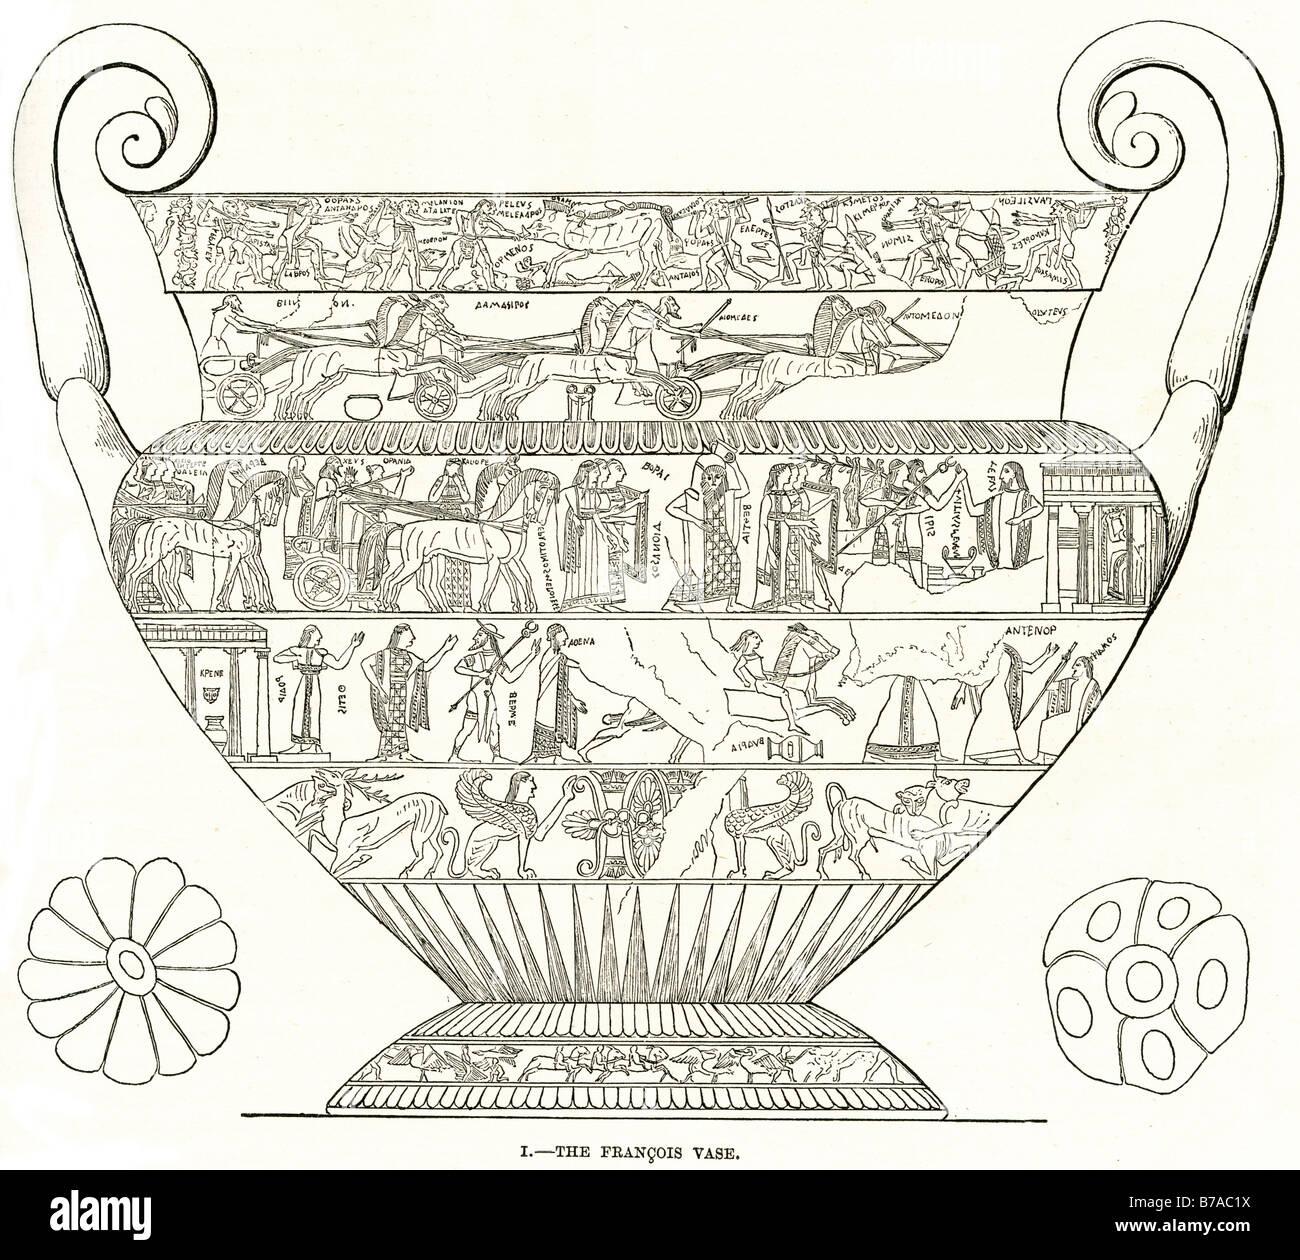 francois vase volute krater Etruscan tomb 1844 hieroglyph Greek pottery Fonte Rotella - Stock Image